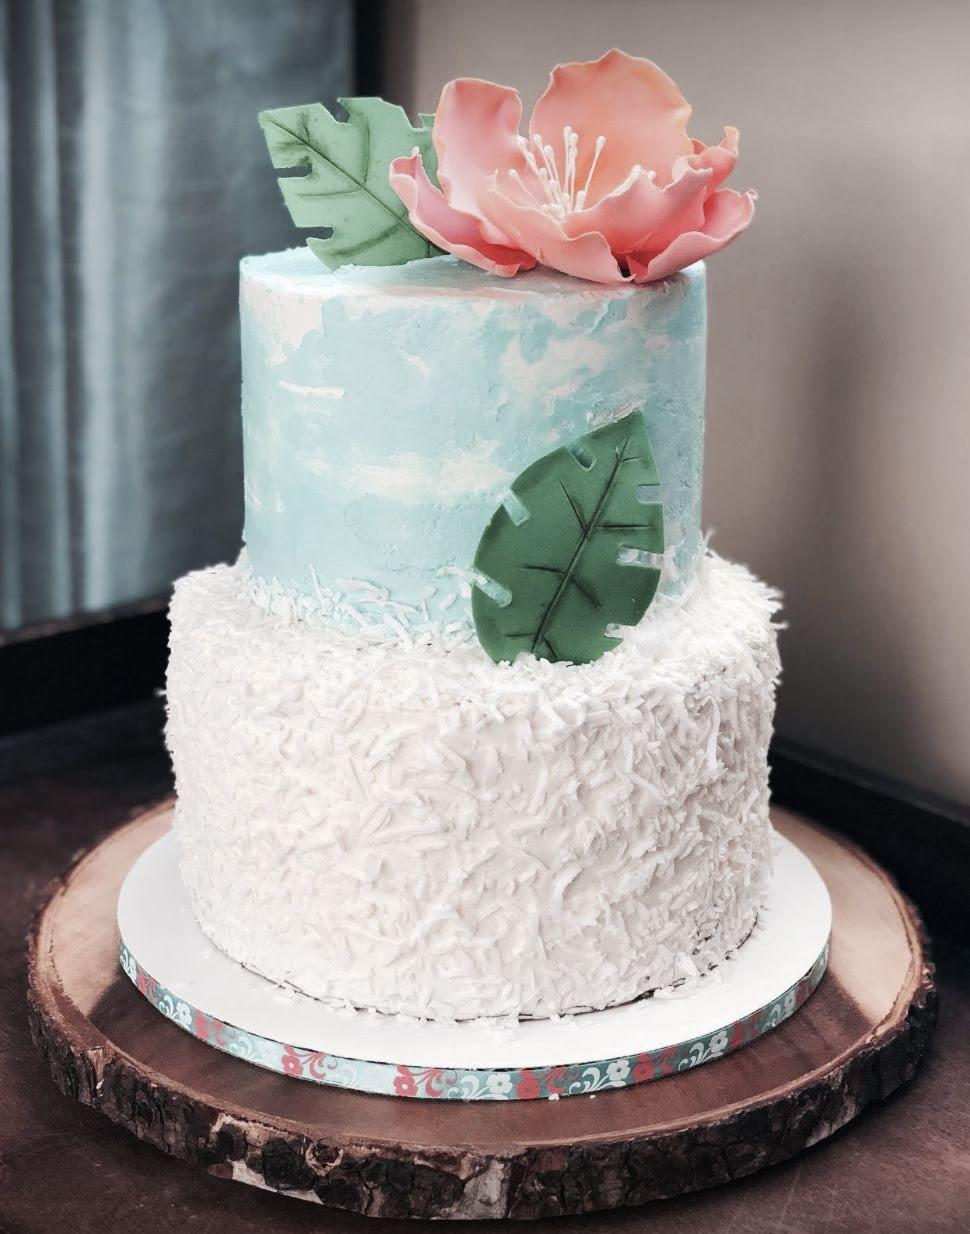 Tropical buttercream Celebratory Cake